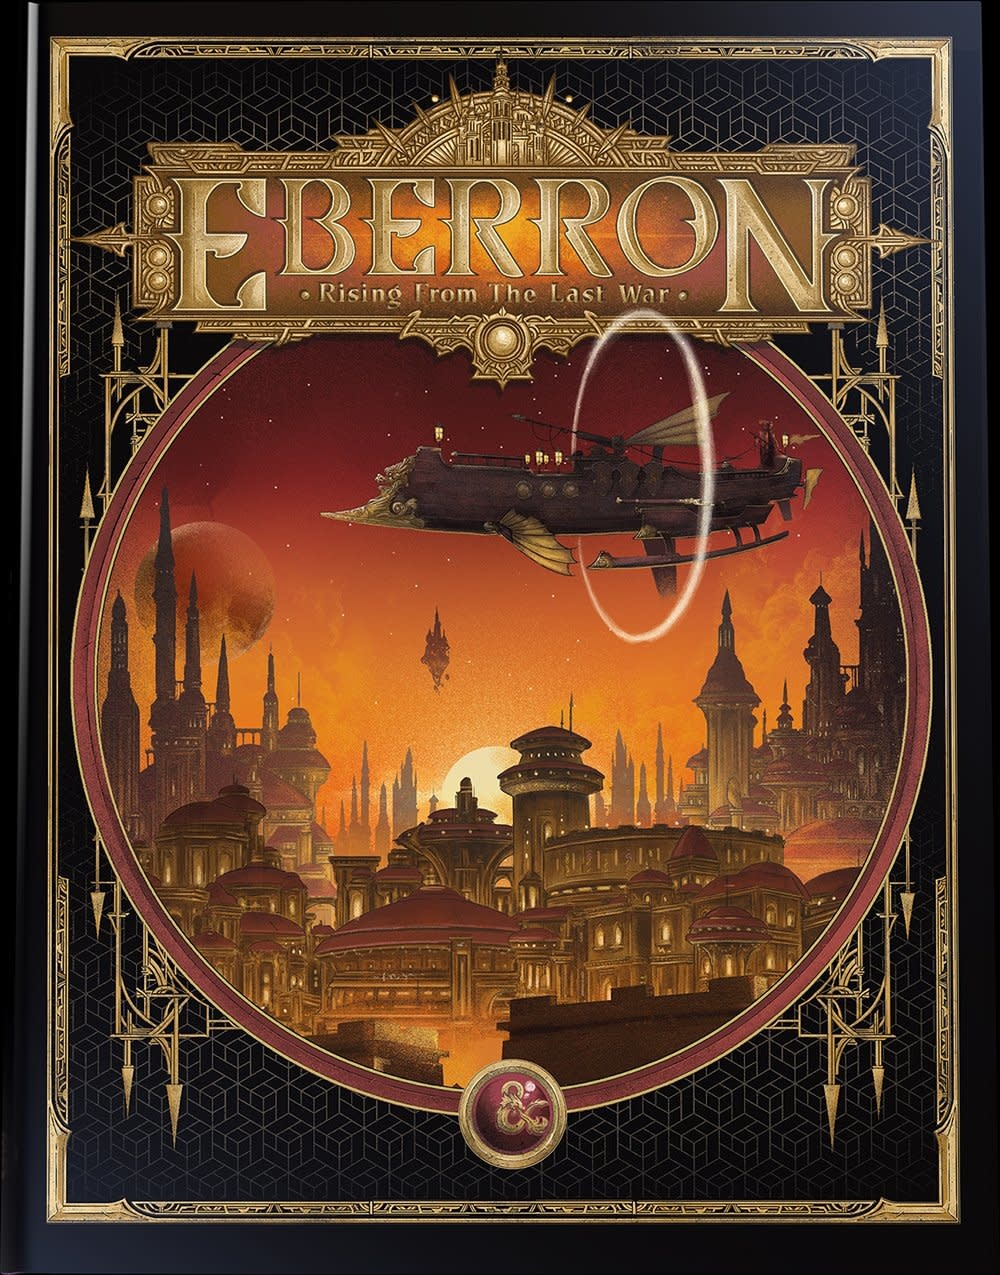 D&D Eberron: Rising from the Last War (Alt. Cover)